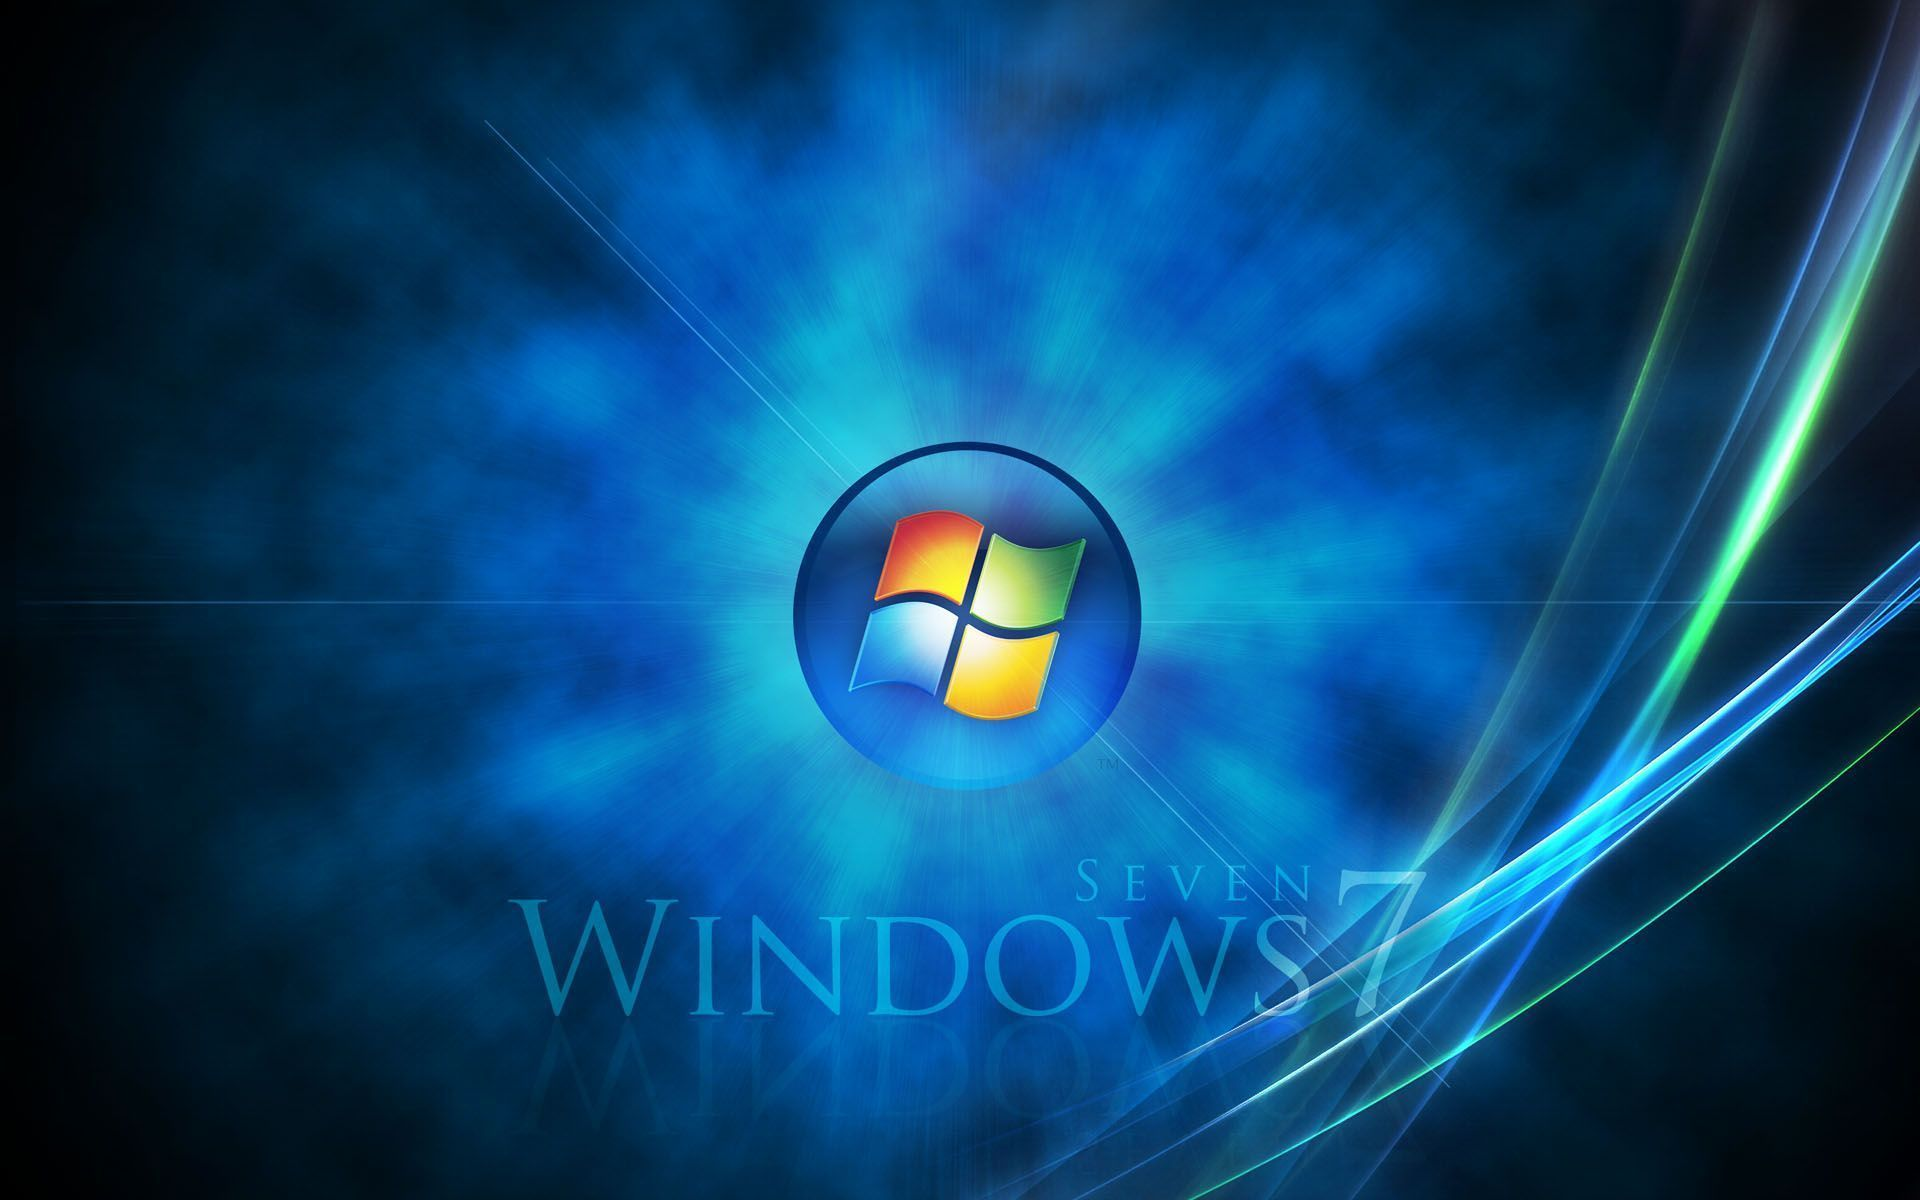 Hd wallpaper free download for windows 7 64 bit